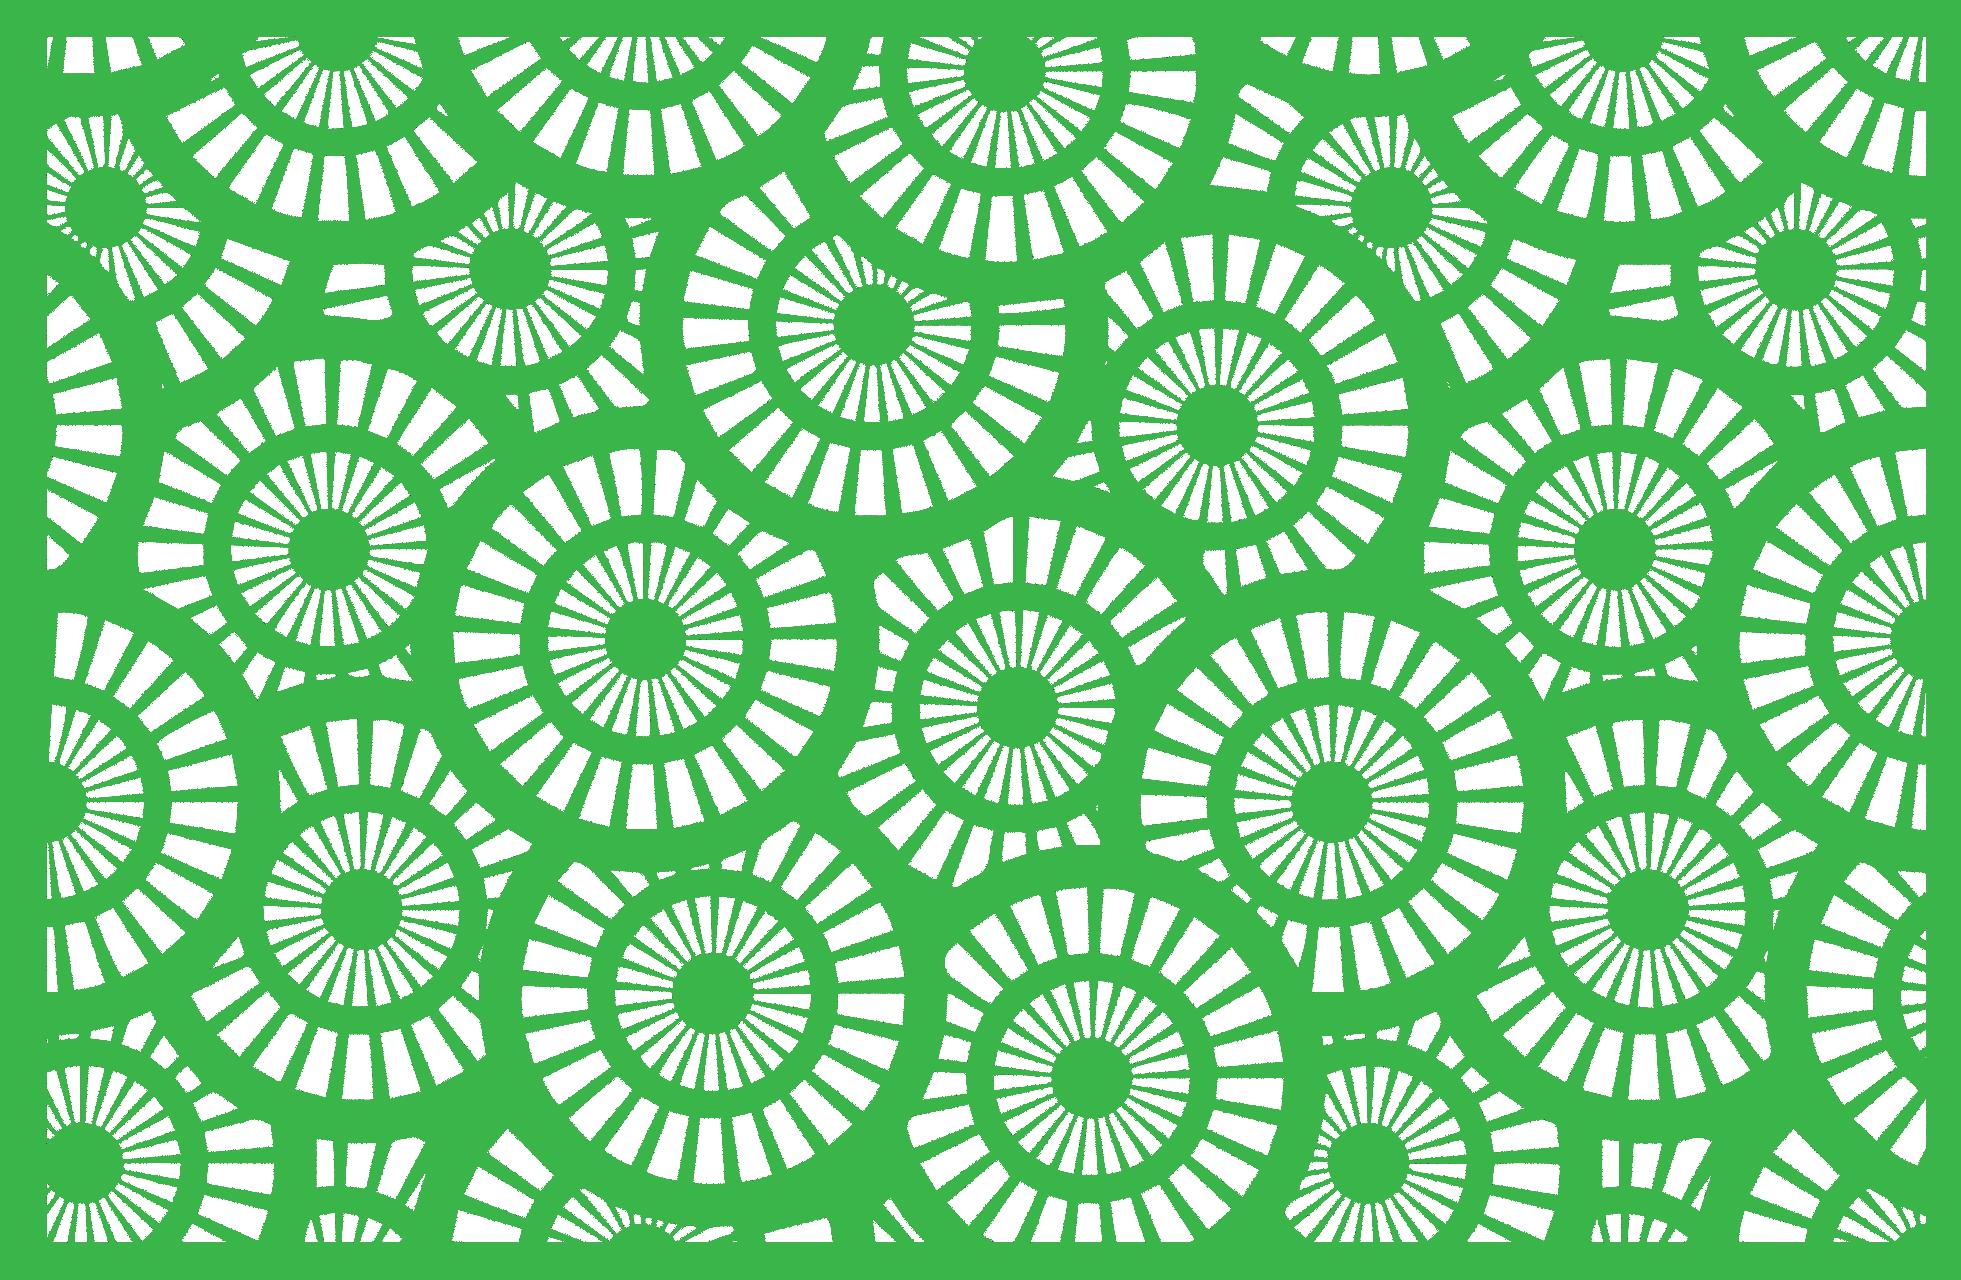 Lasergram Cerchi - Wall Decor - Green Acrylic